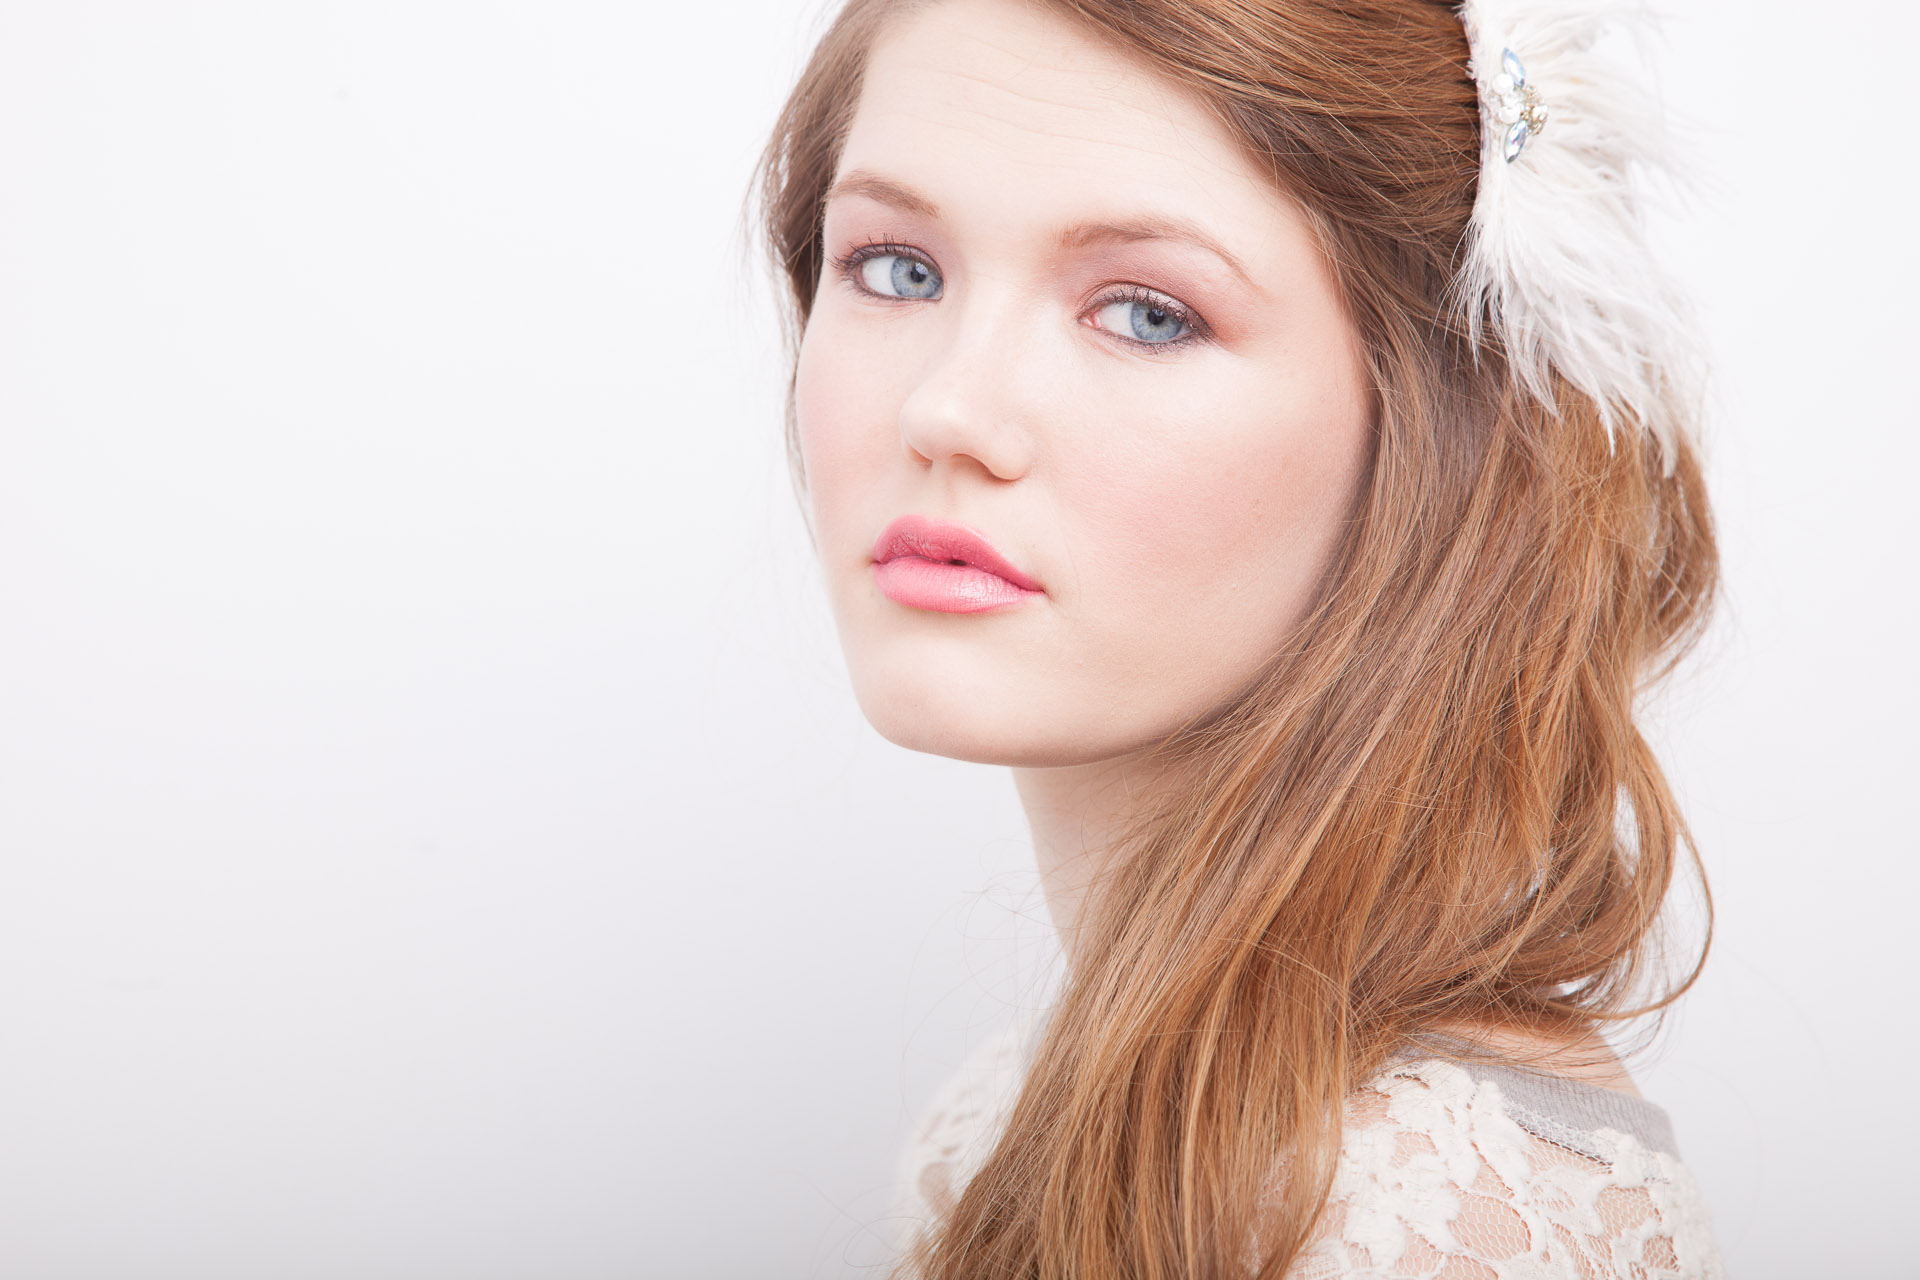 Photography: Shana Schnur || Makeup: Beauty Marks NYC || Location: Downtown, Manhattan